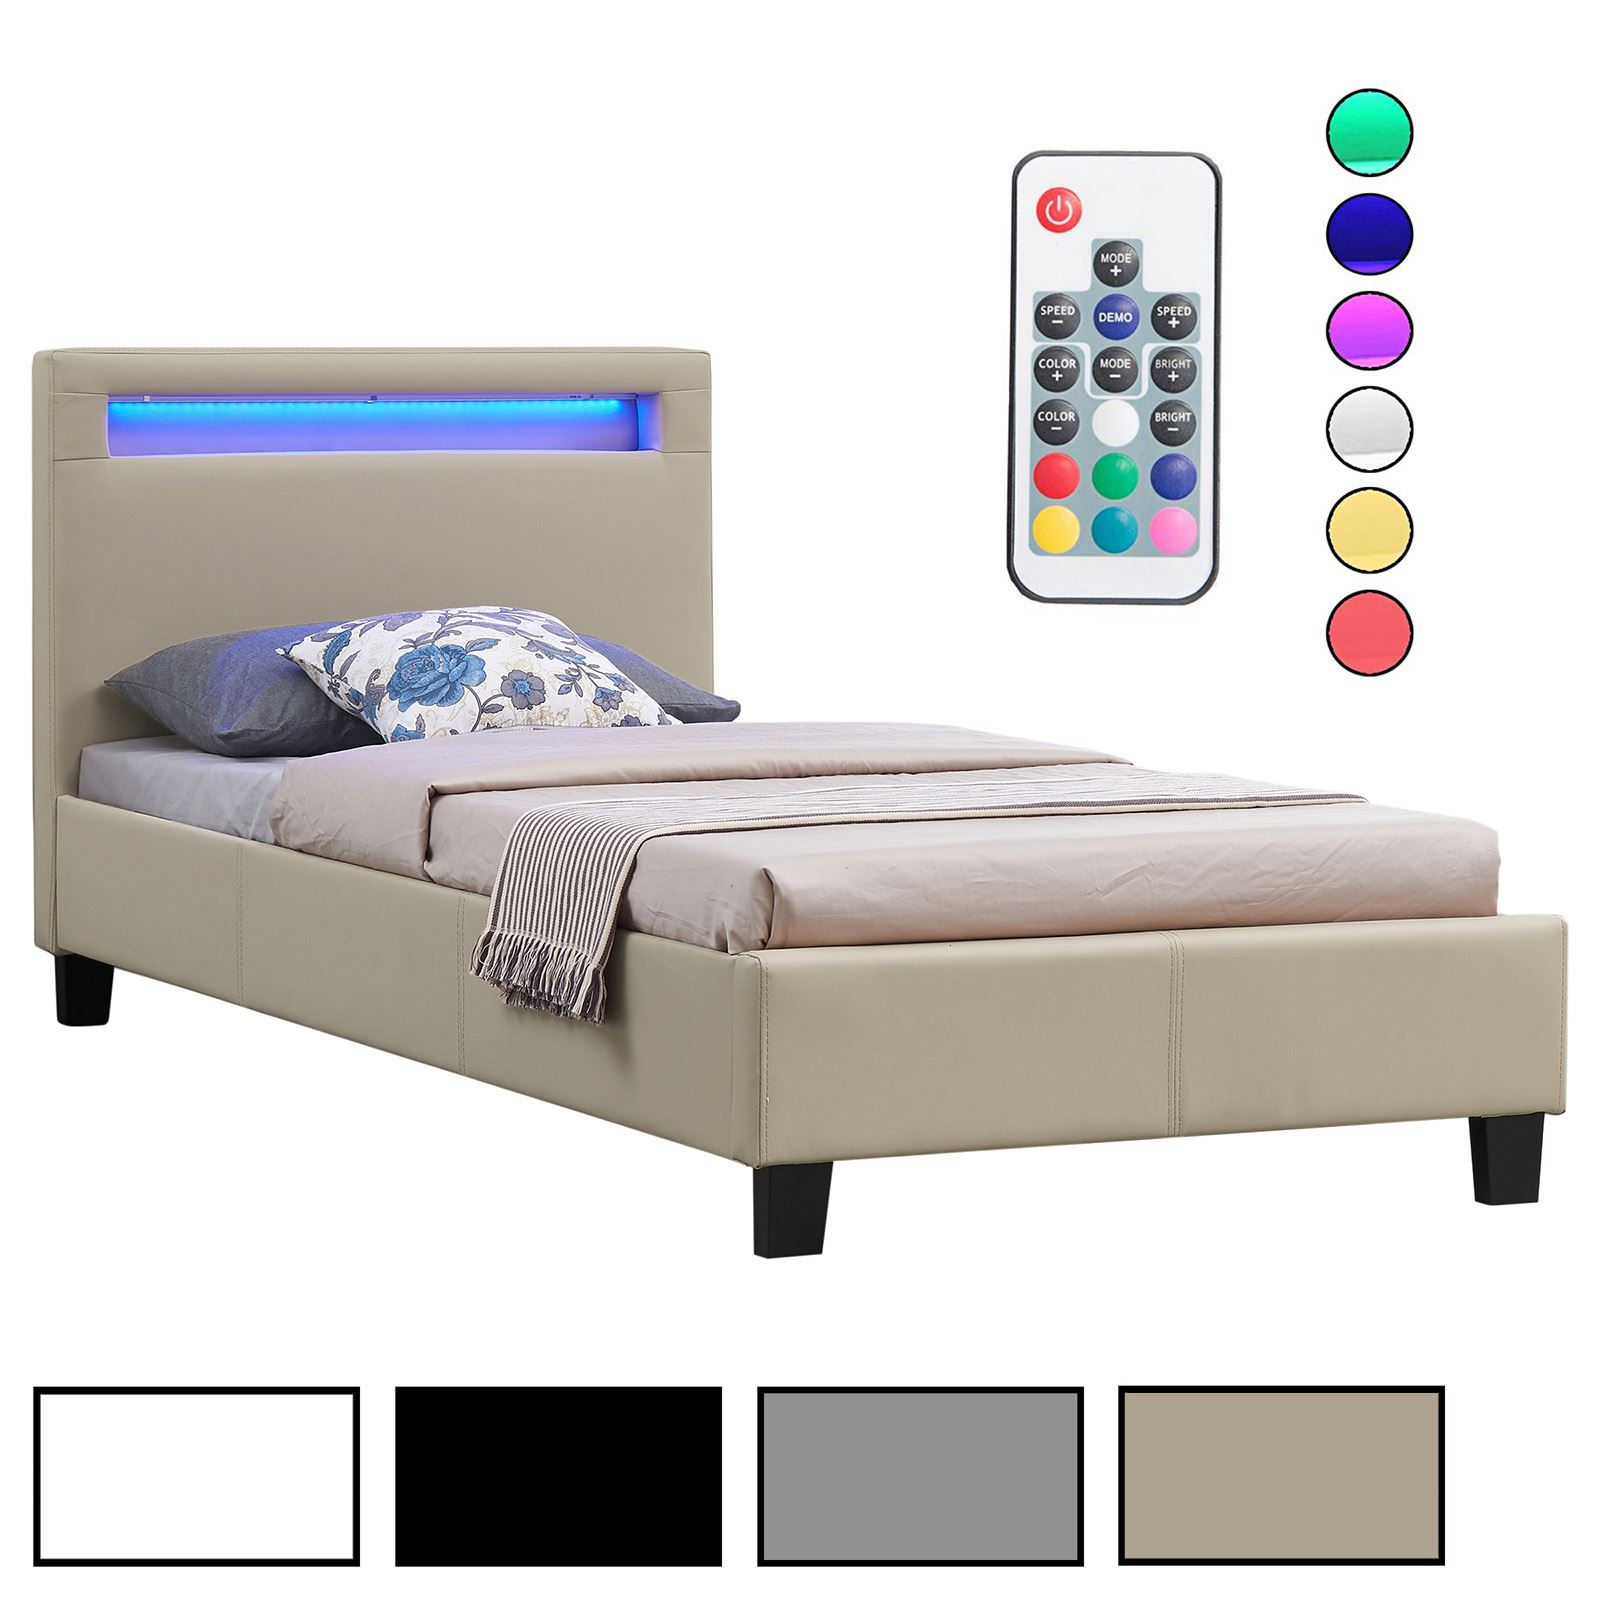 Möbel Betten Bettgestelle Ohne Matratze Doppelbett